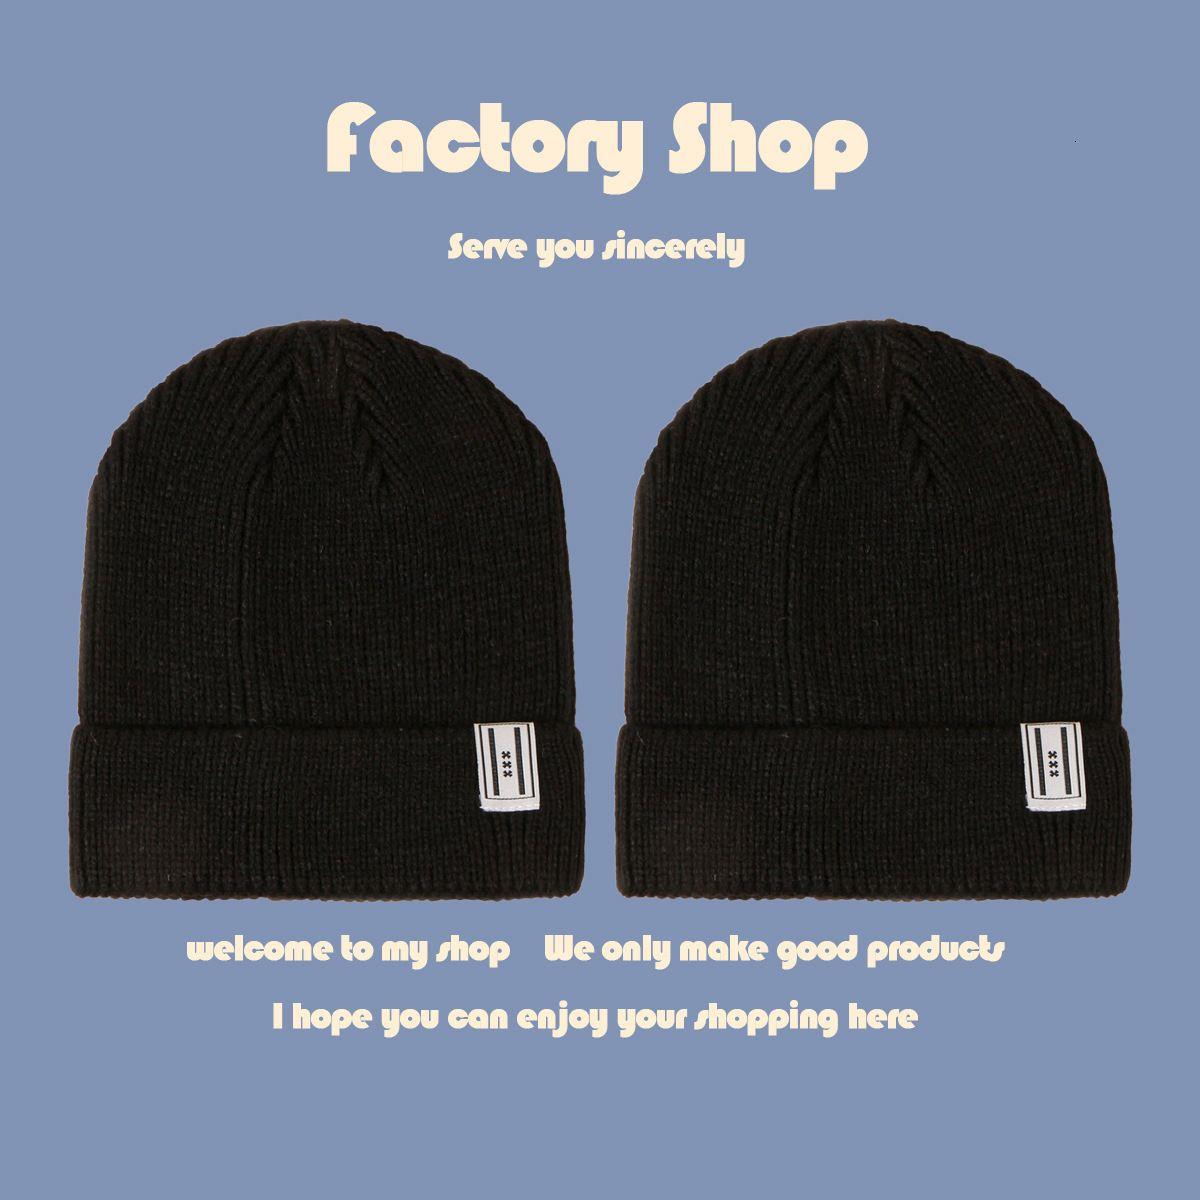 Розетка 2021 Новая черная вязаная мужская корейская универсальная теплая шерстяная шапка